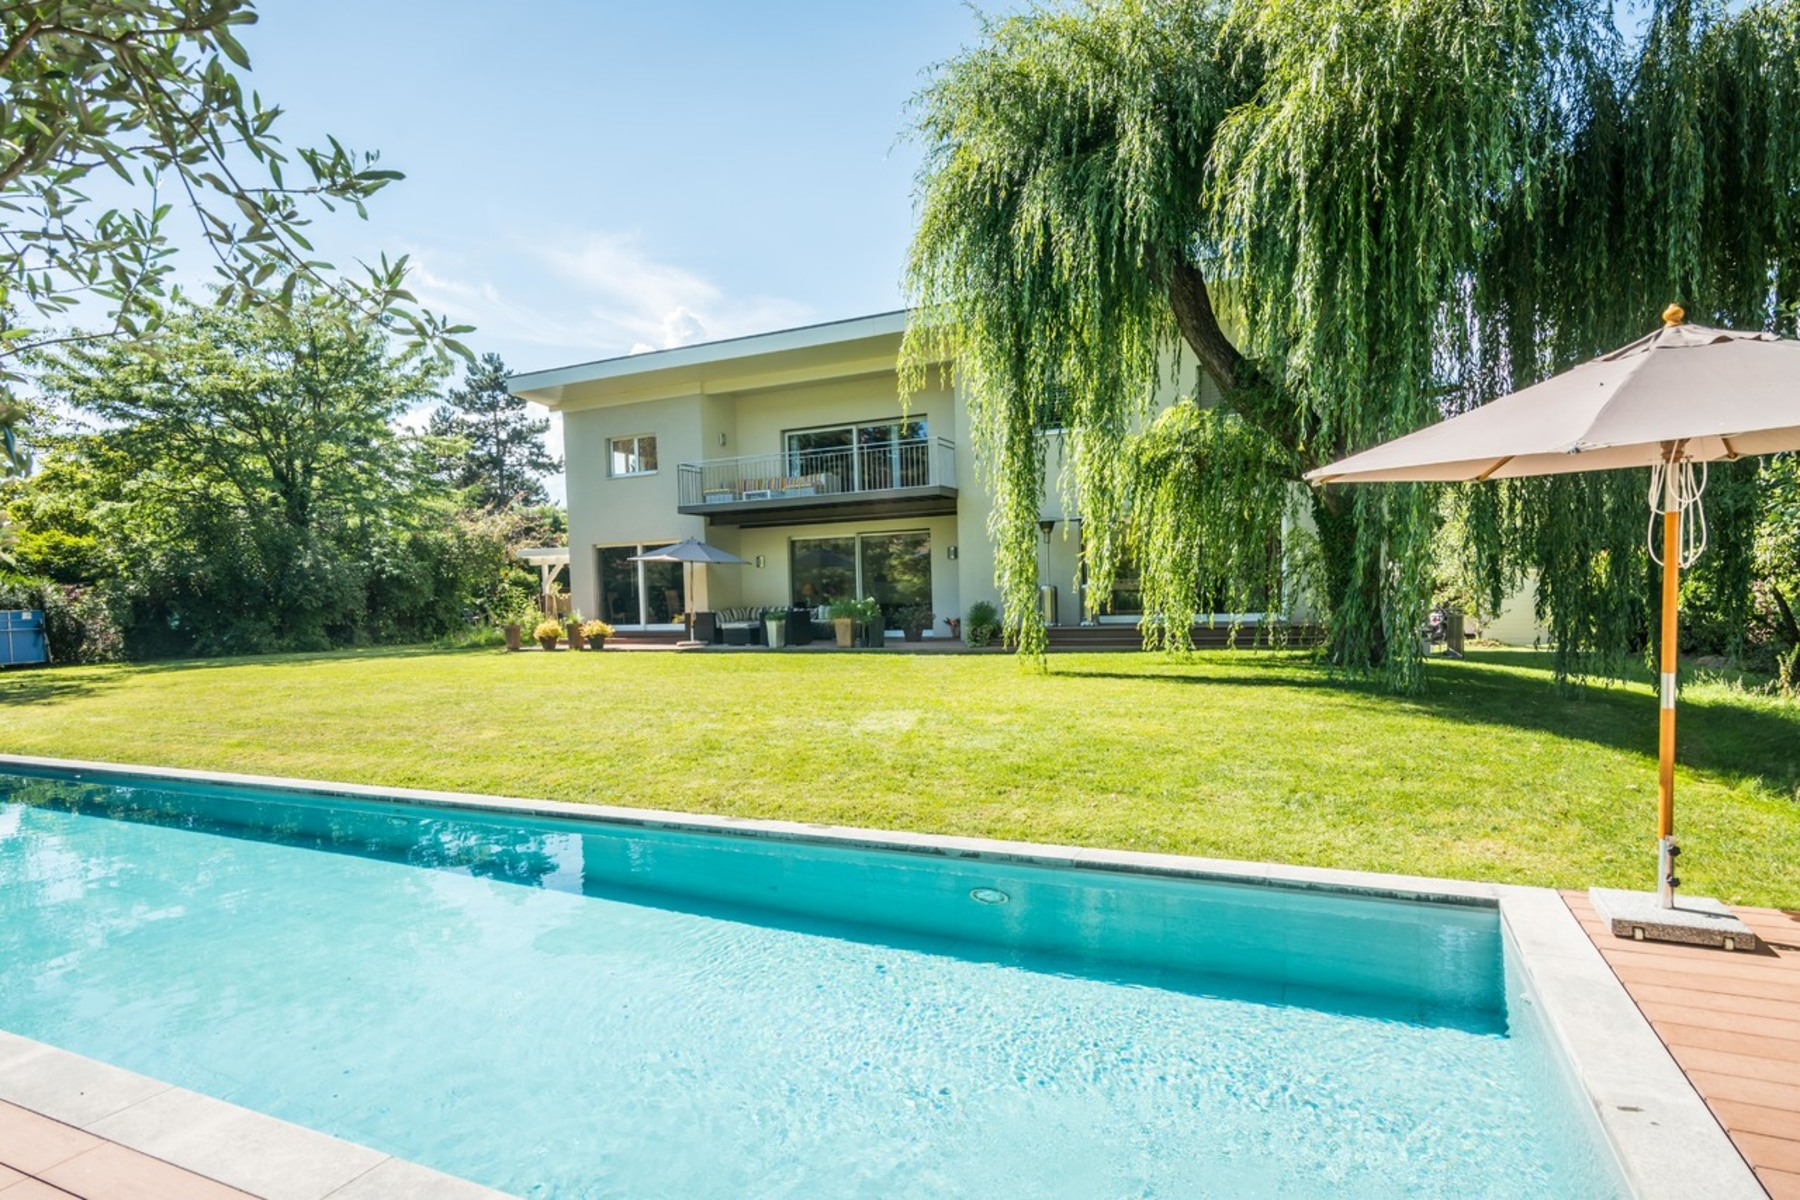 Additional photo for property listing at Detached, spacious villa with plenty of natural light Vandoeuvres Vandoeuvres, Geneva 1253 Switzerland